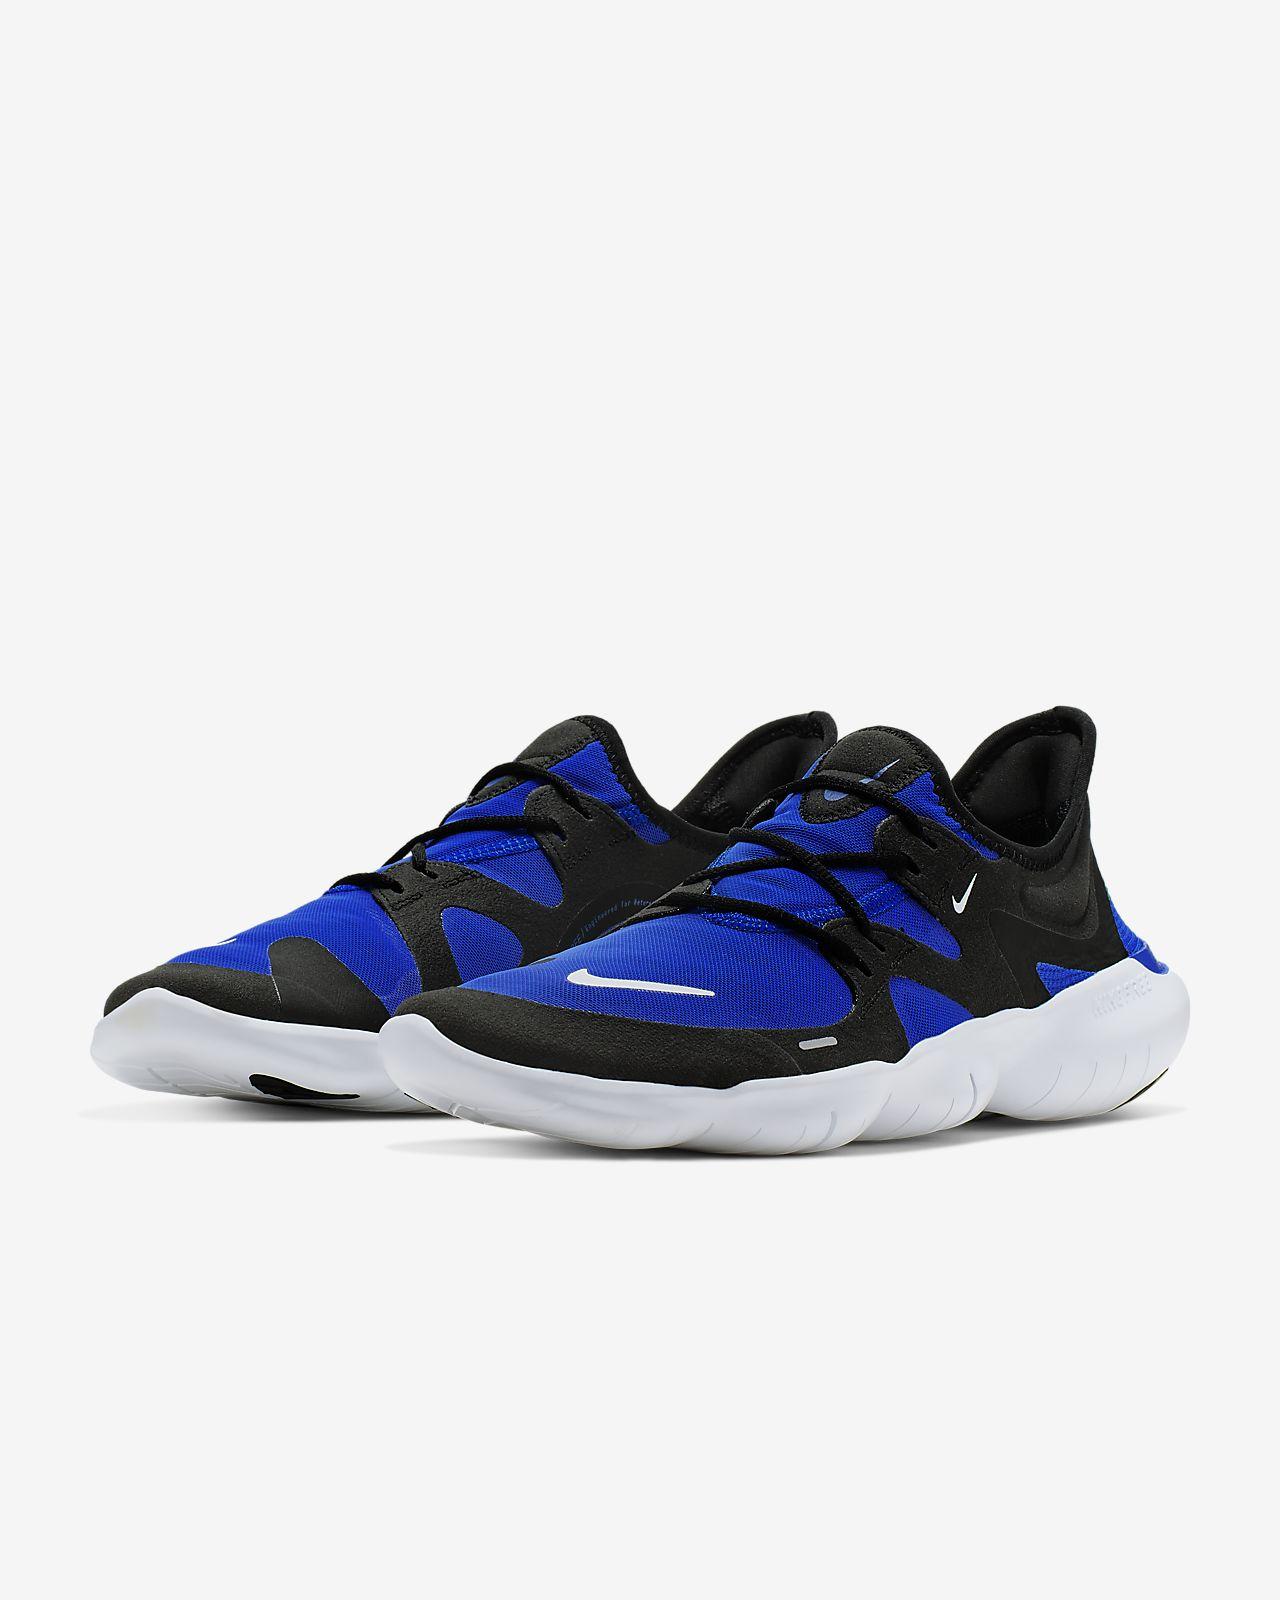 Nike Free RN 5.0 AQ1289 402